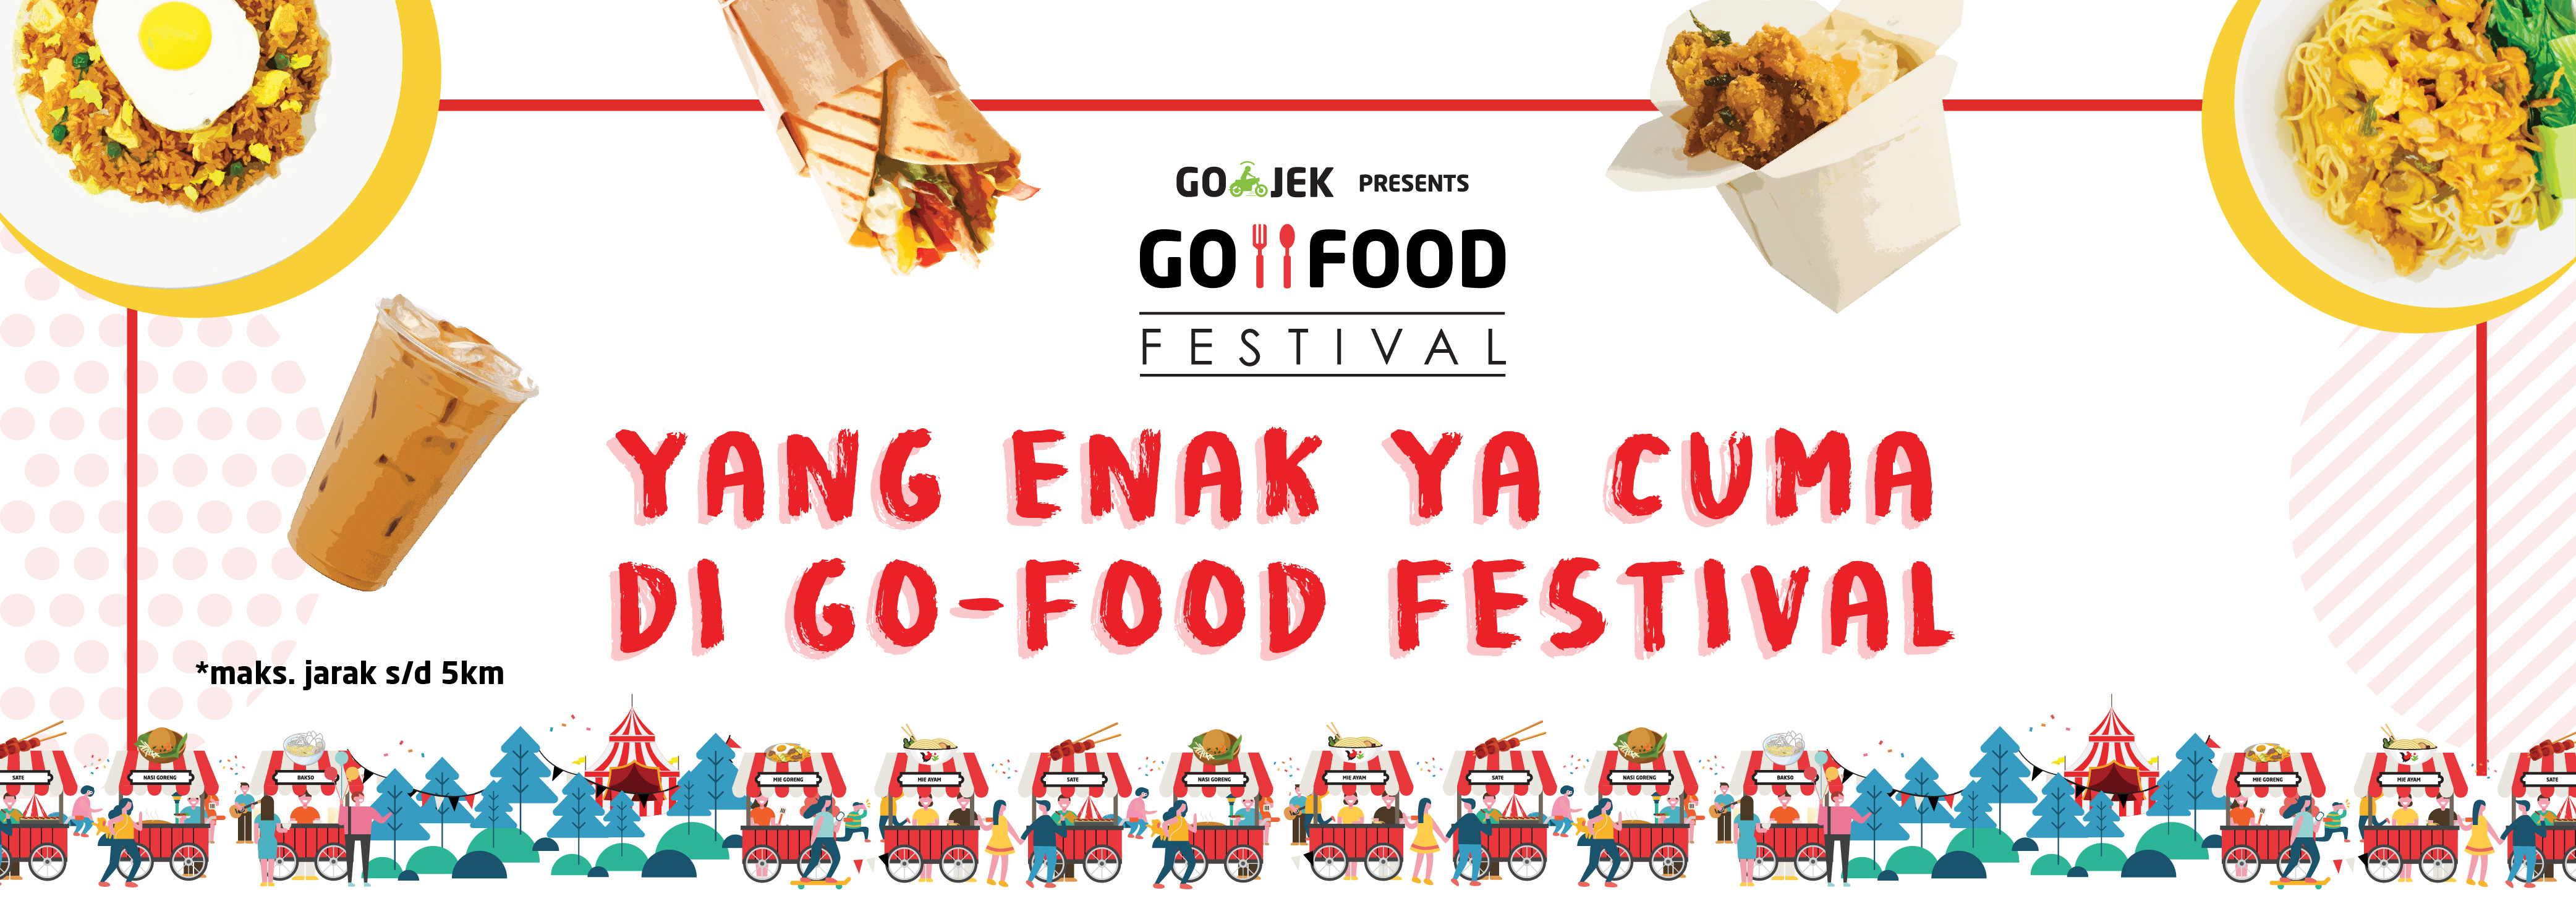 Nikmati Cashback Hingga 50 Di Go Food Festival Bandung